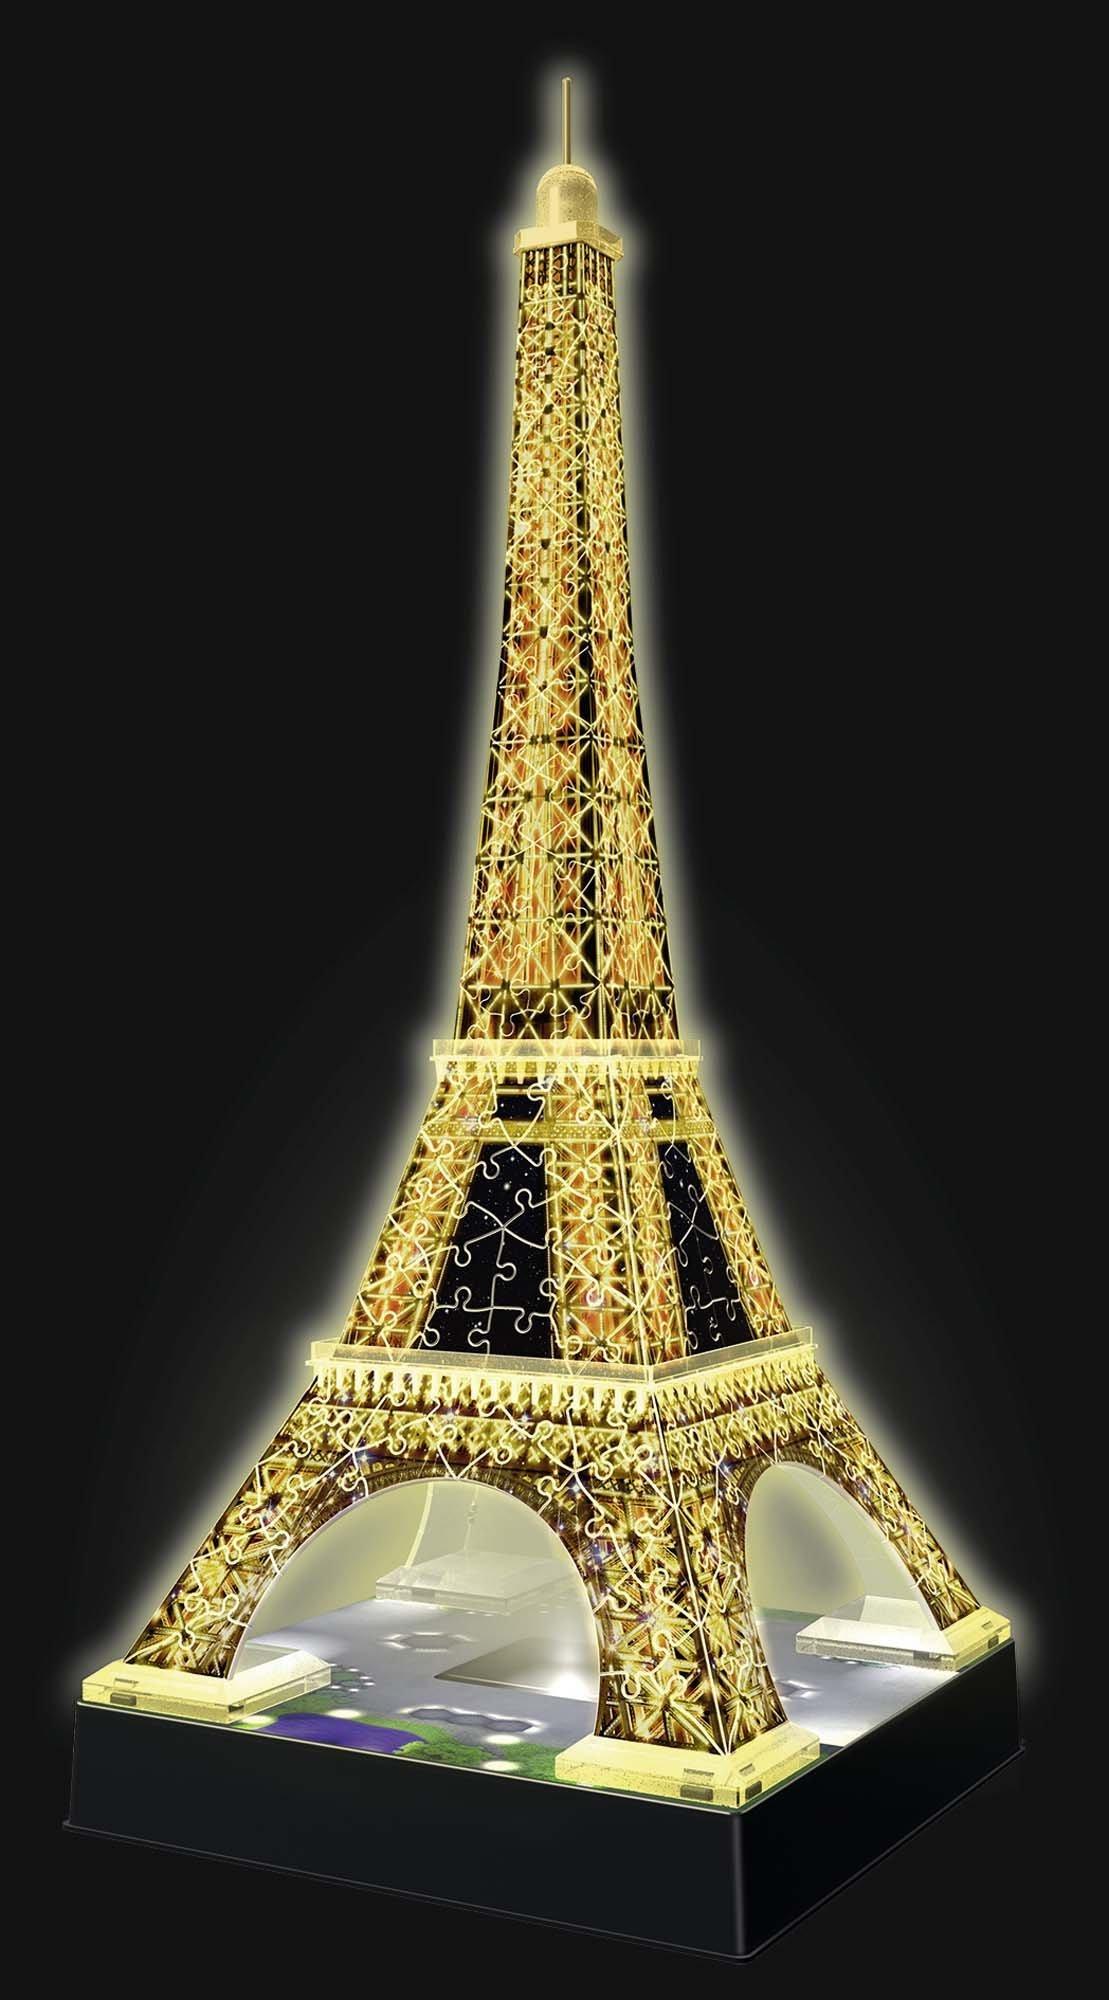 Ravensburger- Tour Torre Eiffel Puzzle 3D con LED, Edizione Speciale Notte, 216 Pezzi, Multicolore, 12579 3 spesavip